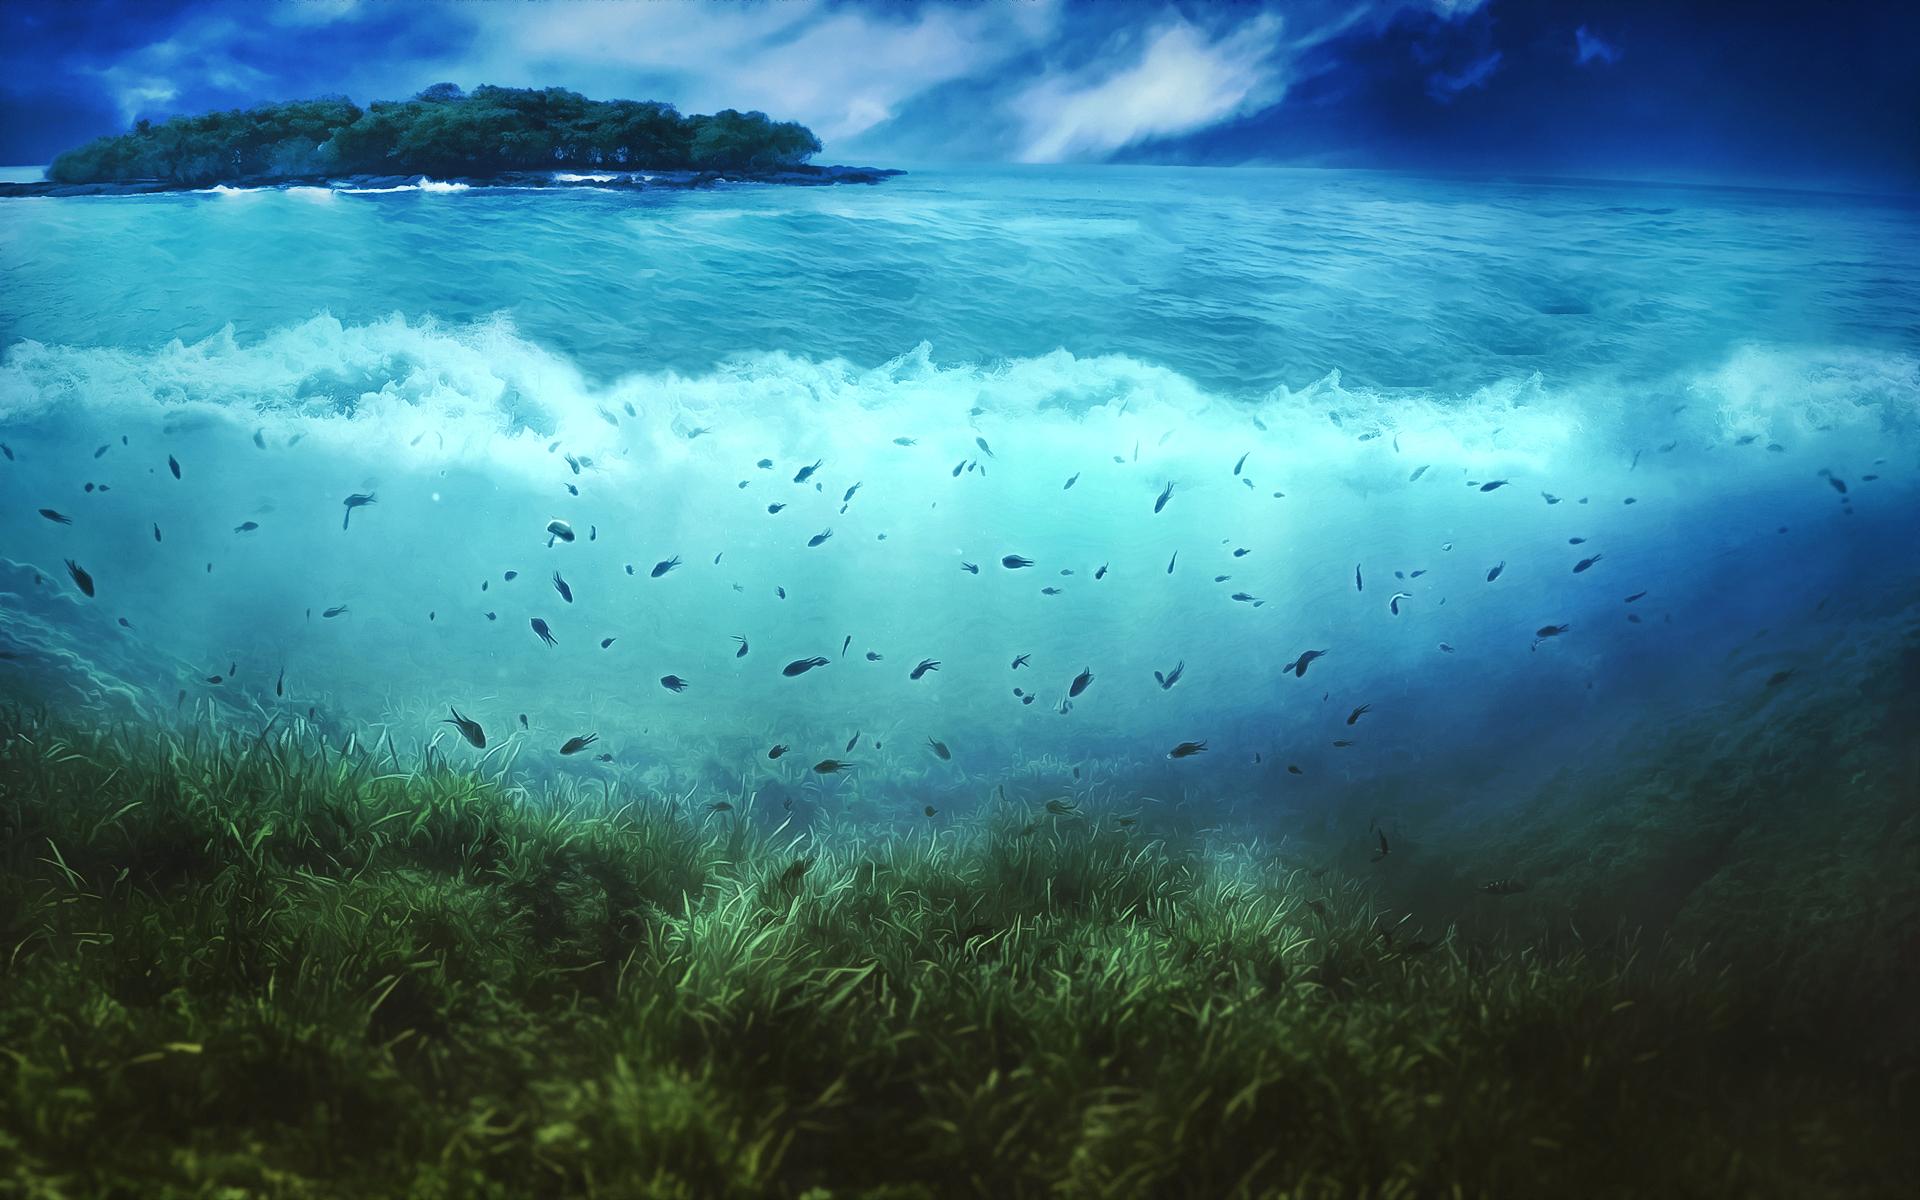 Ocean Life Wallpaper 1920x1200